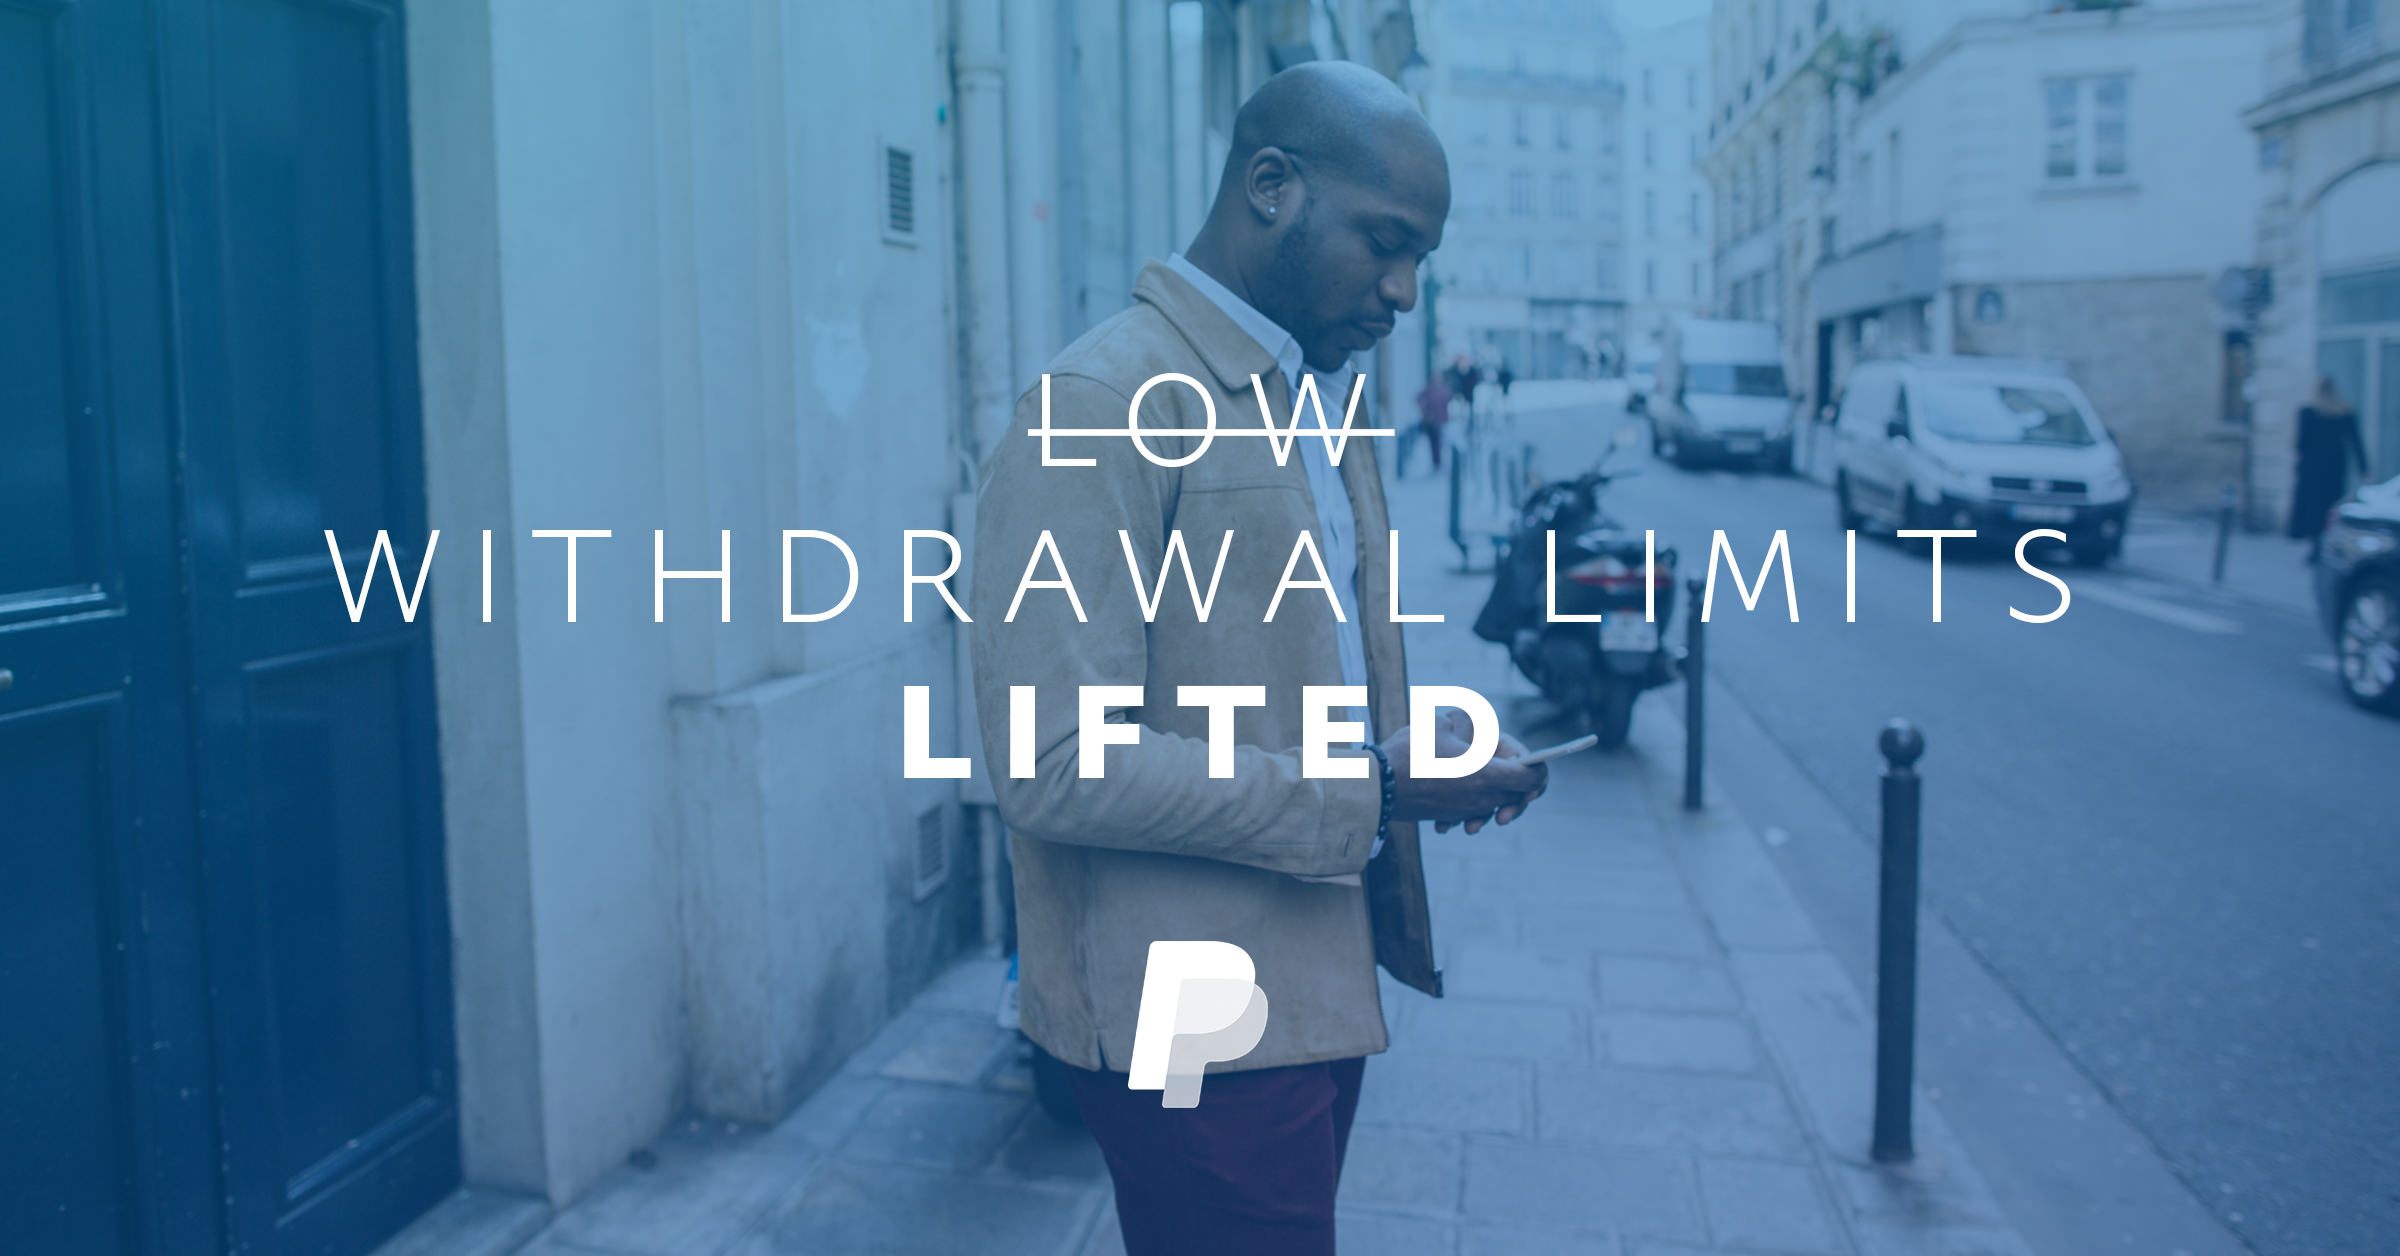 041717_0007_Withdrawel Limits A.jpg